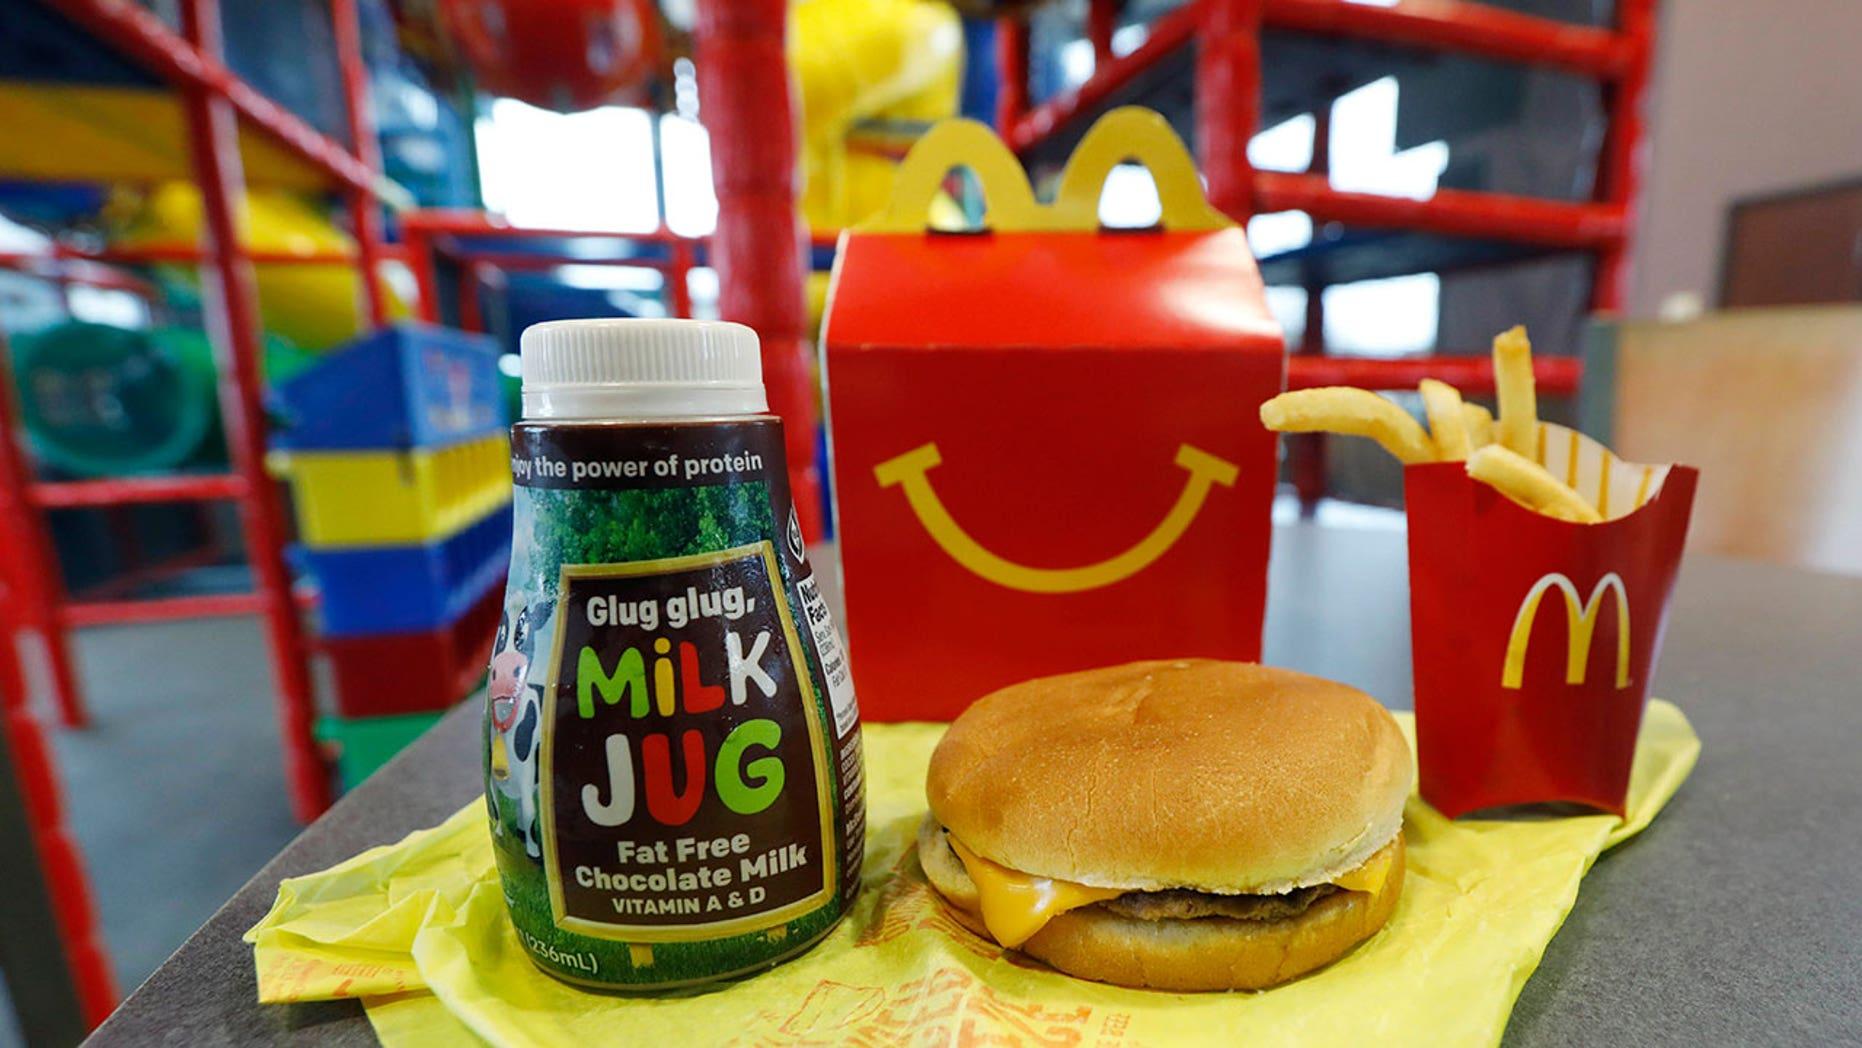 McDonald's won't be offering cheeseburgers on Happy Meal menus in U.S. restaurants starting in June.